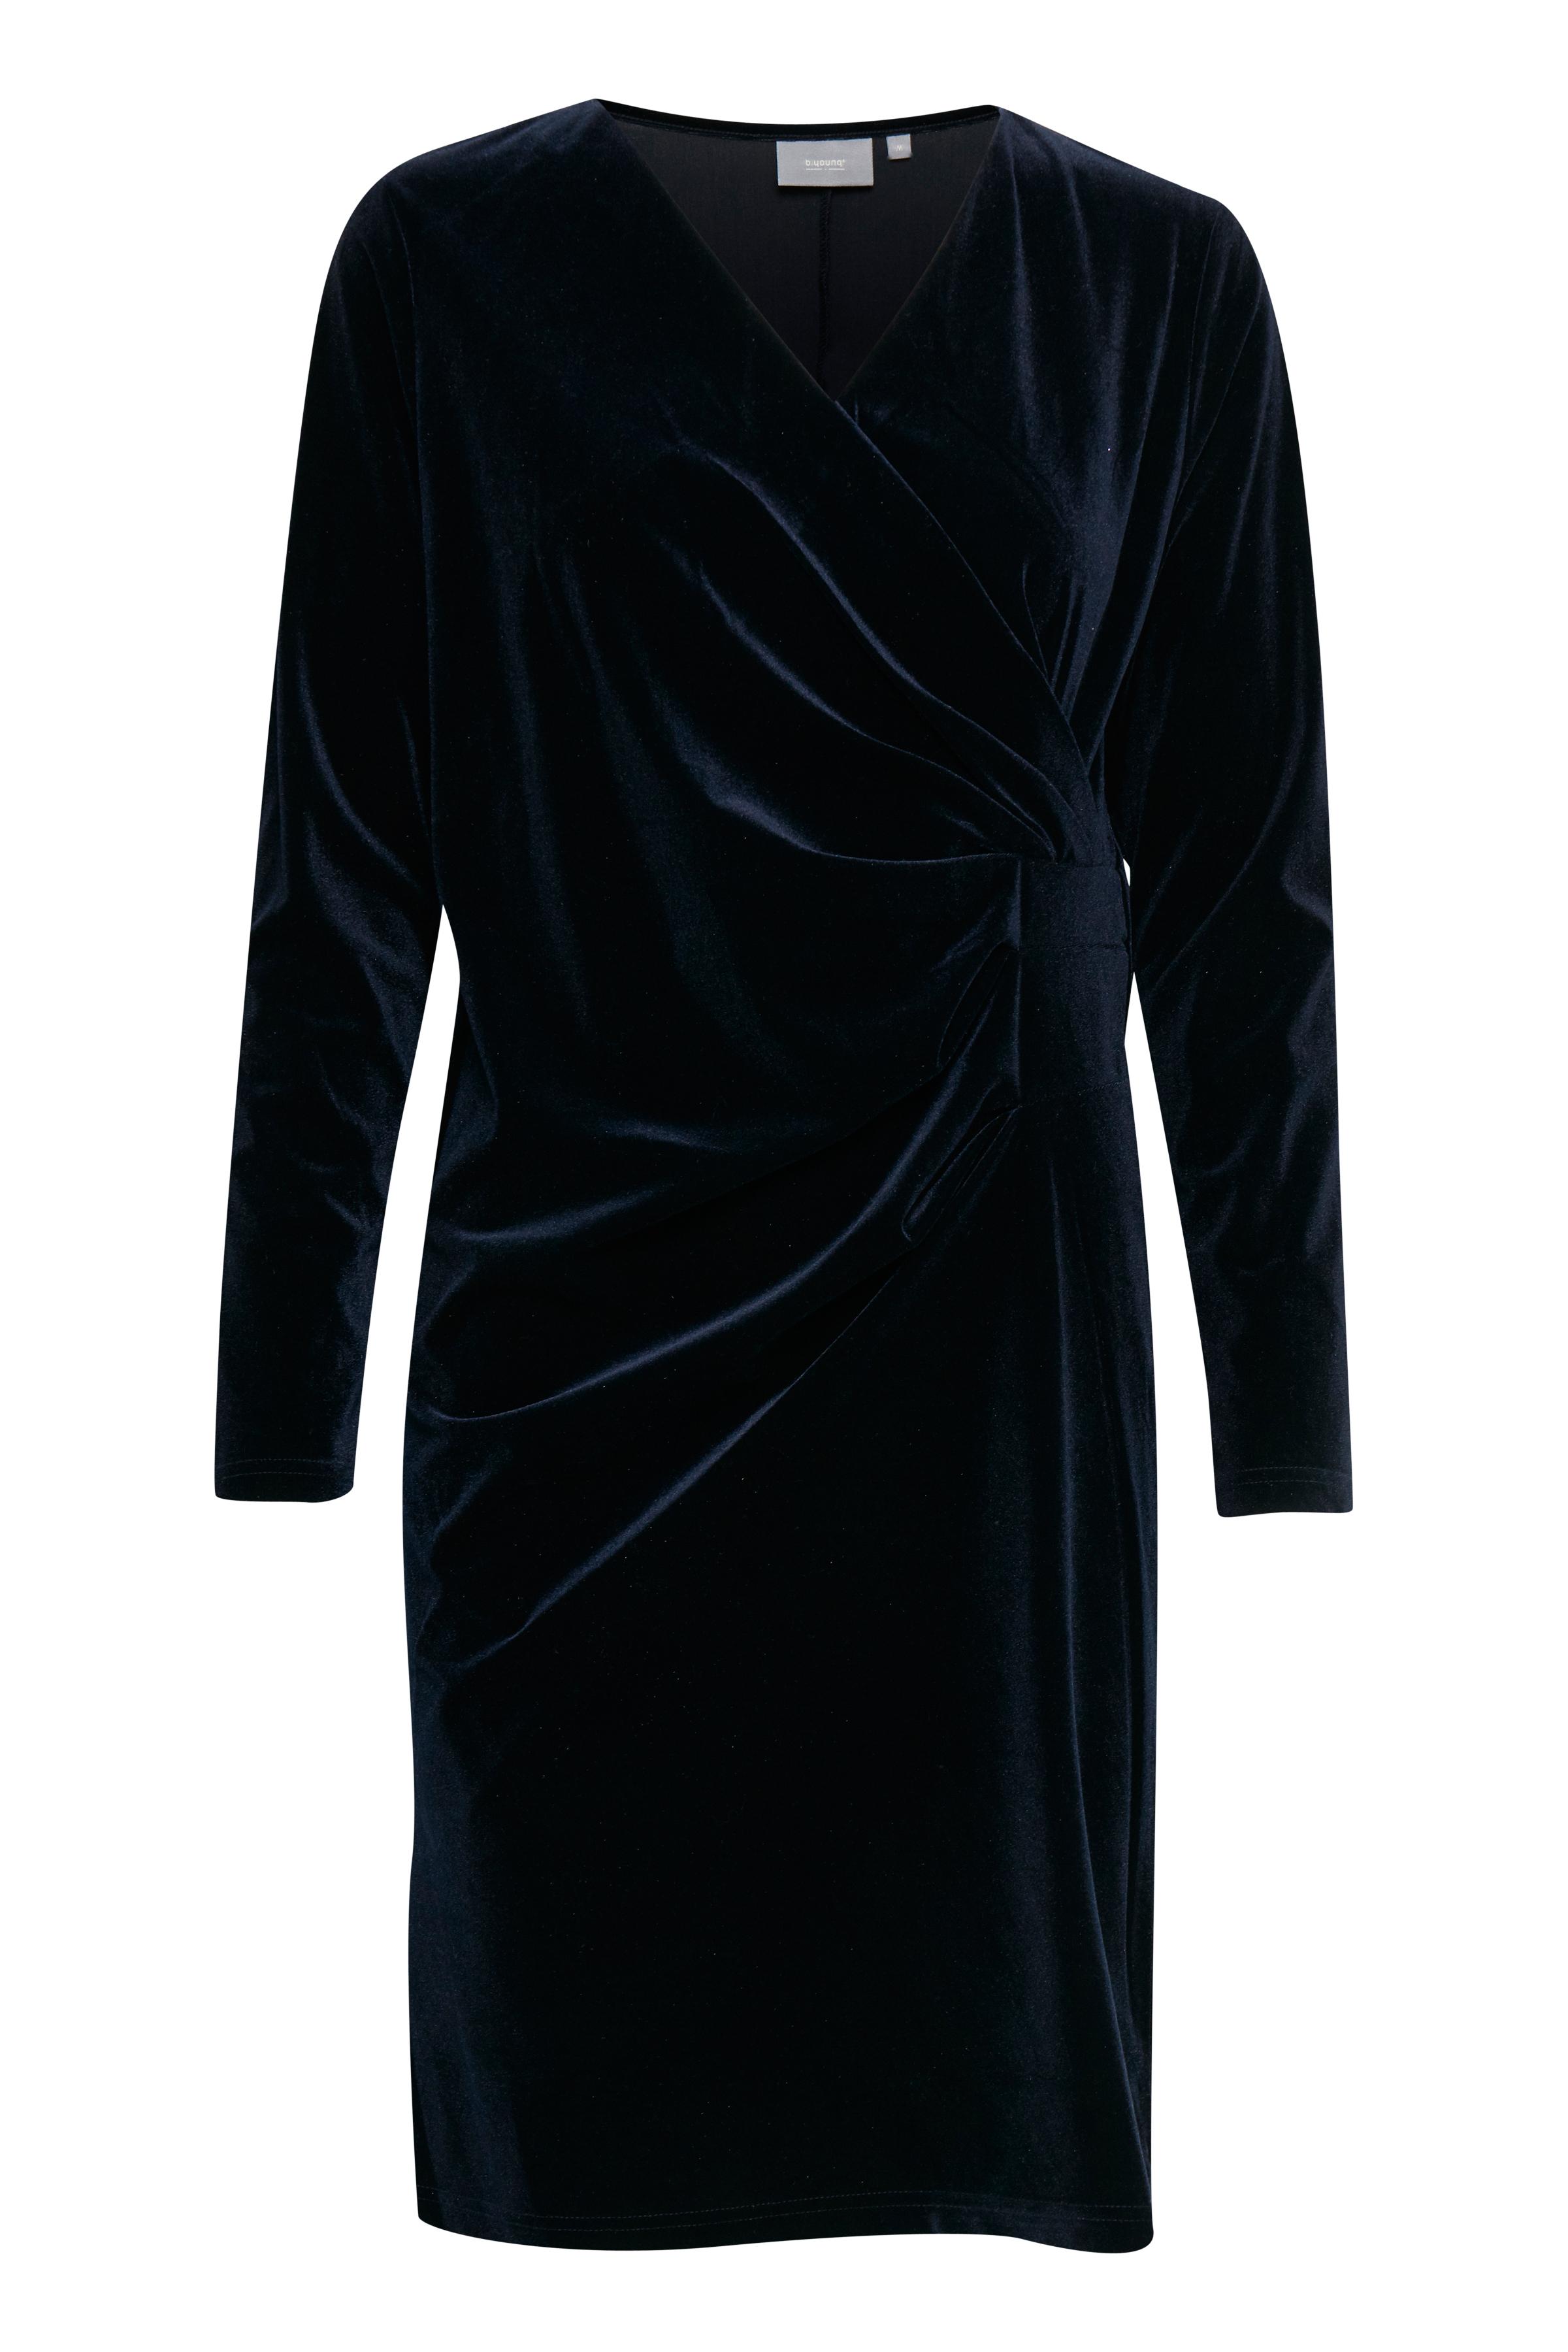 Copenhagen Night Jersey dress from b.young – Buy Copenhagen Night Jersey dress from size XS-XL here